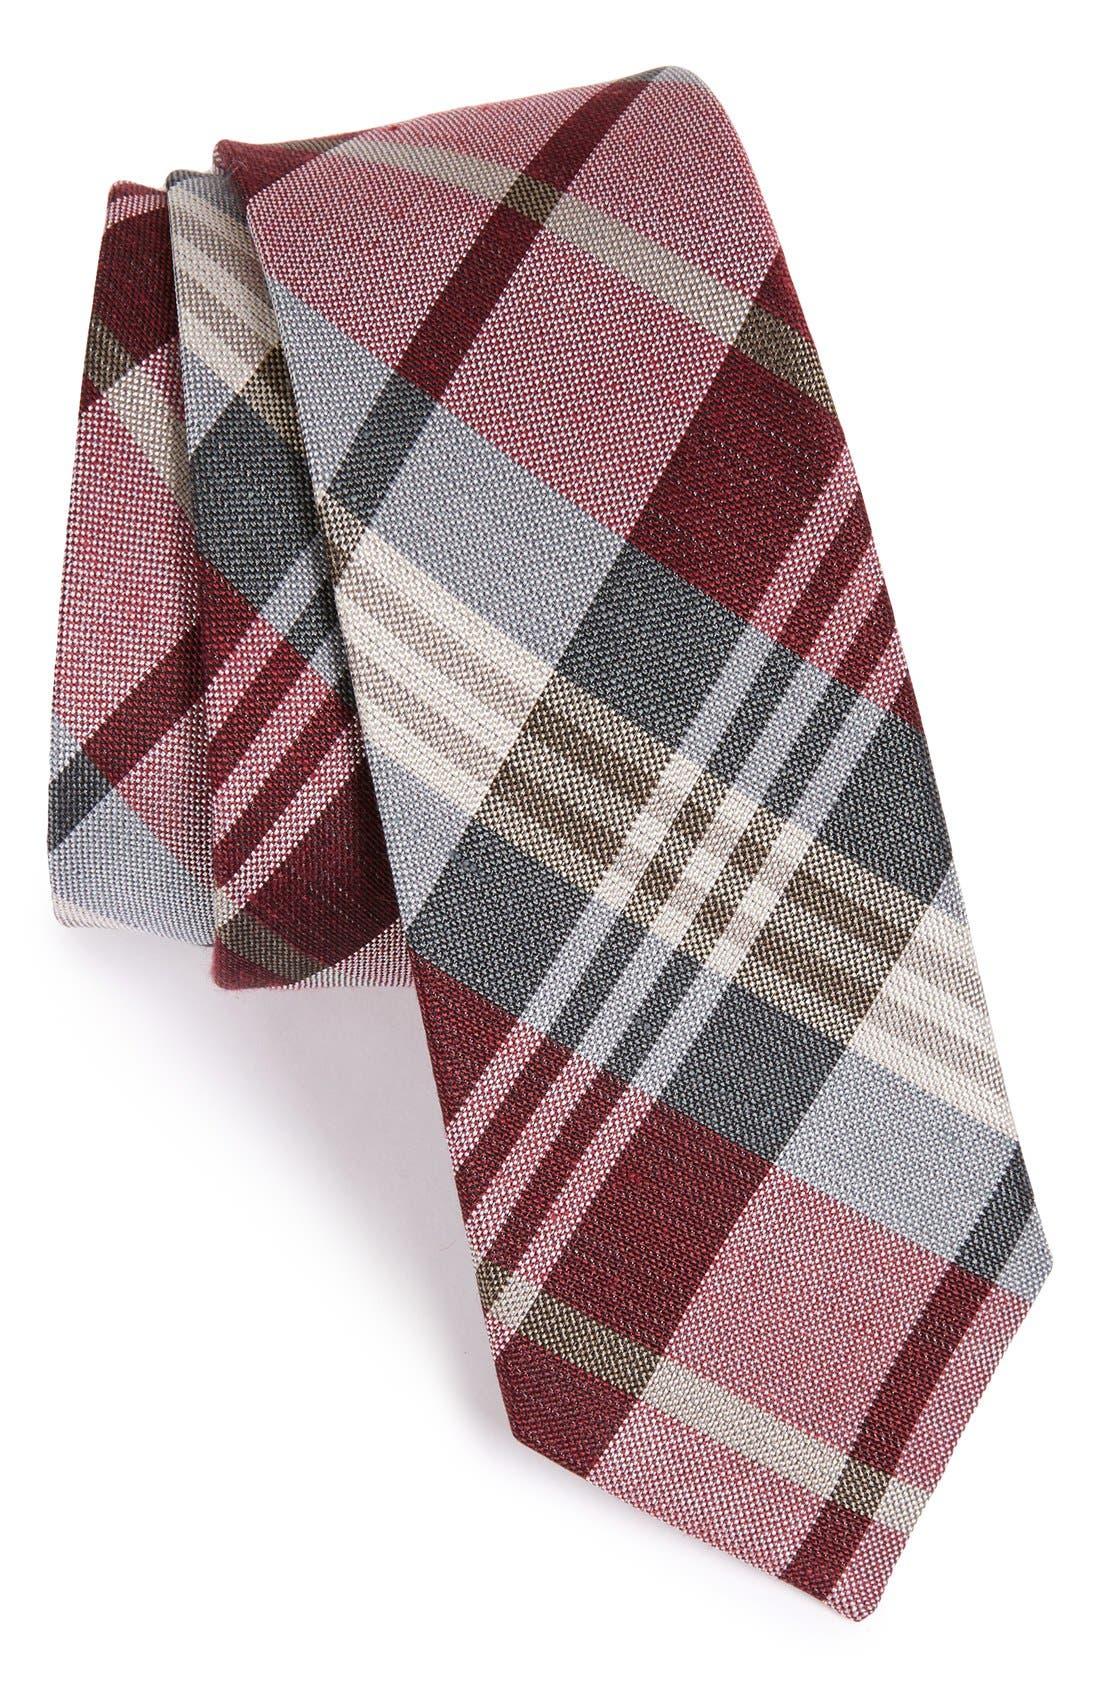 Main Image - The Tie Bar Plaid Silk & Linen Tie